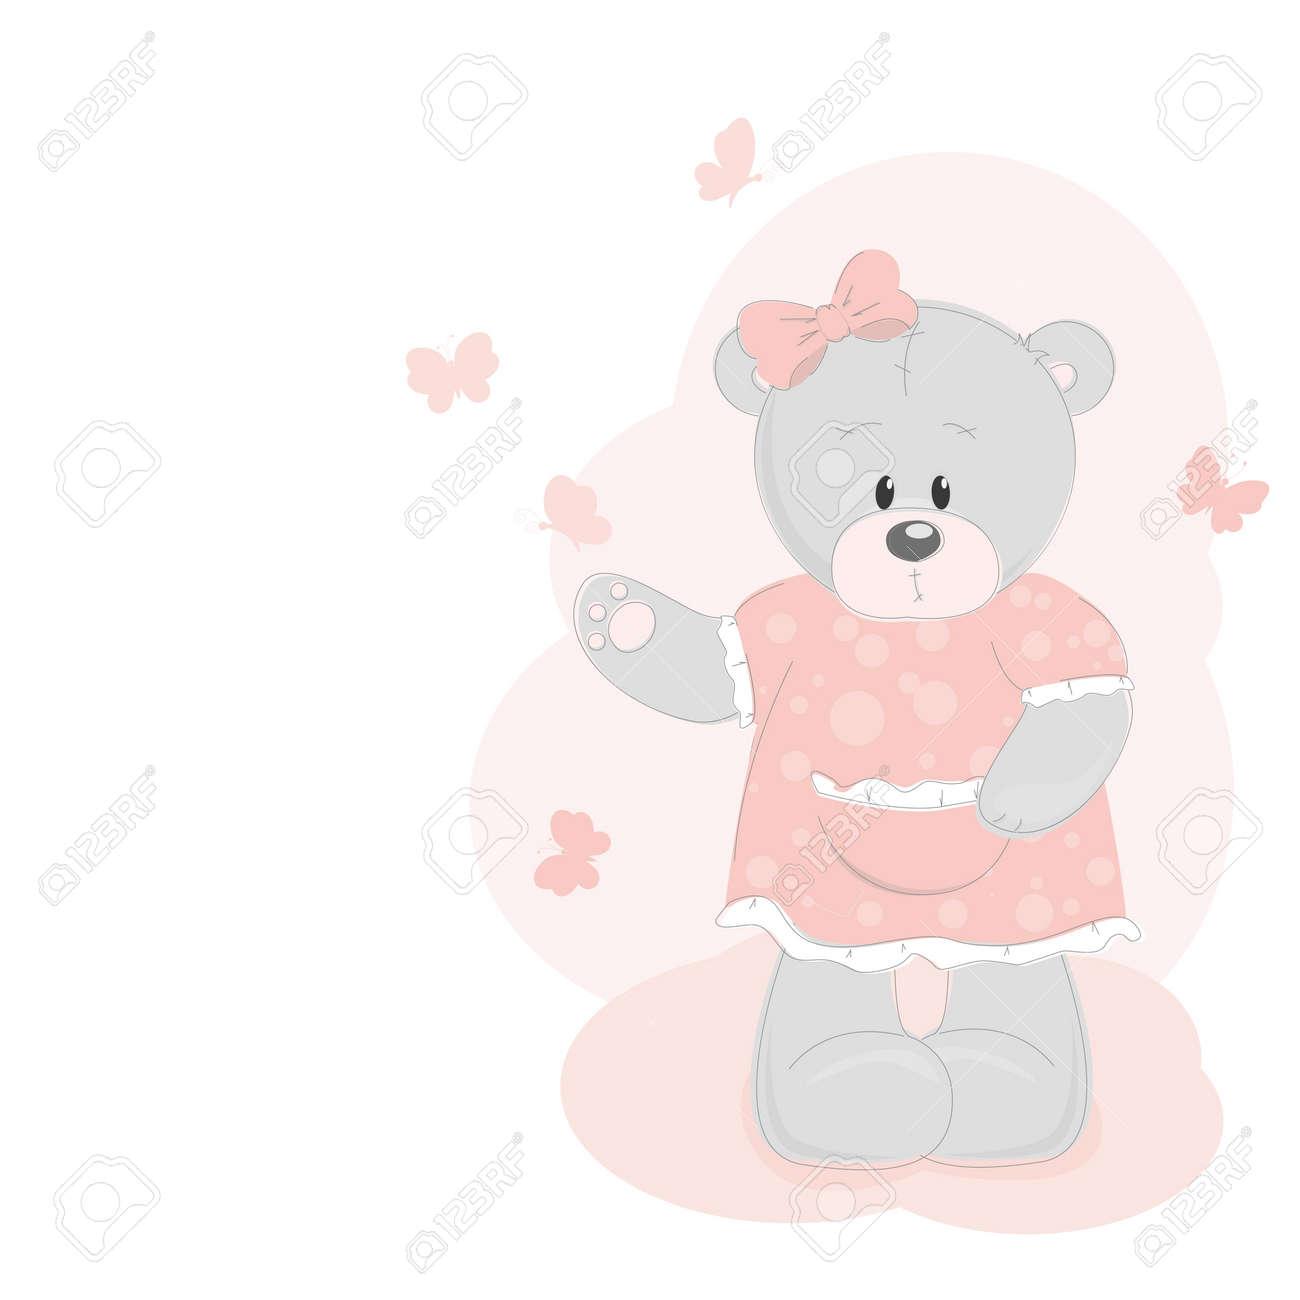 Teddy bear and butterfly Stock Vector - 12933913